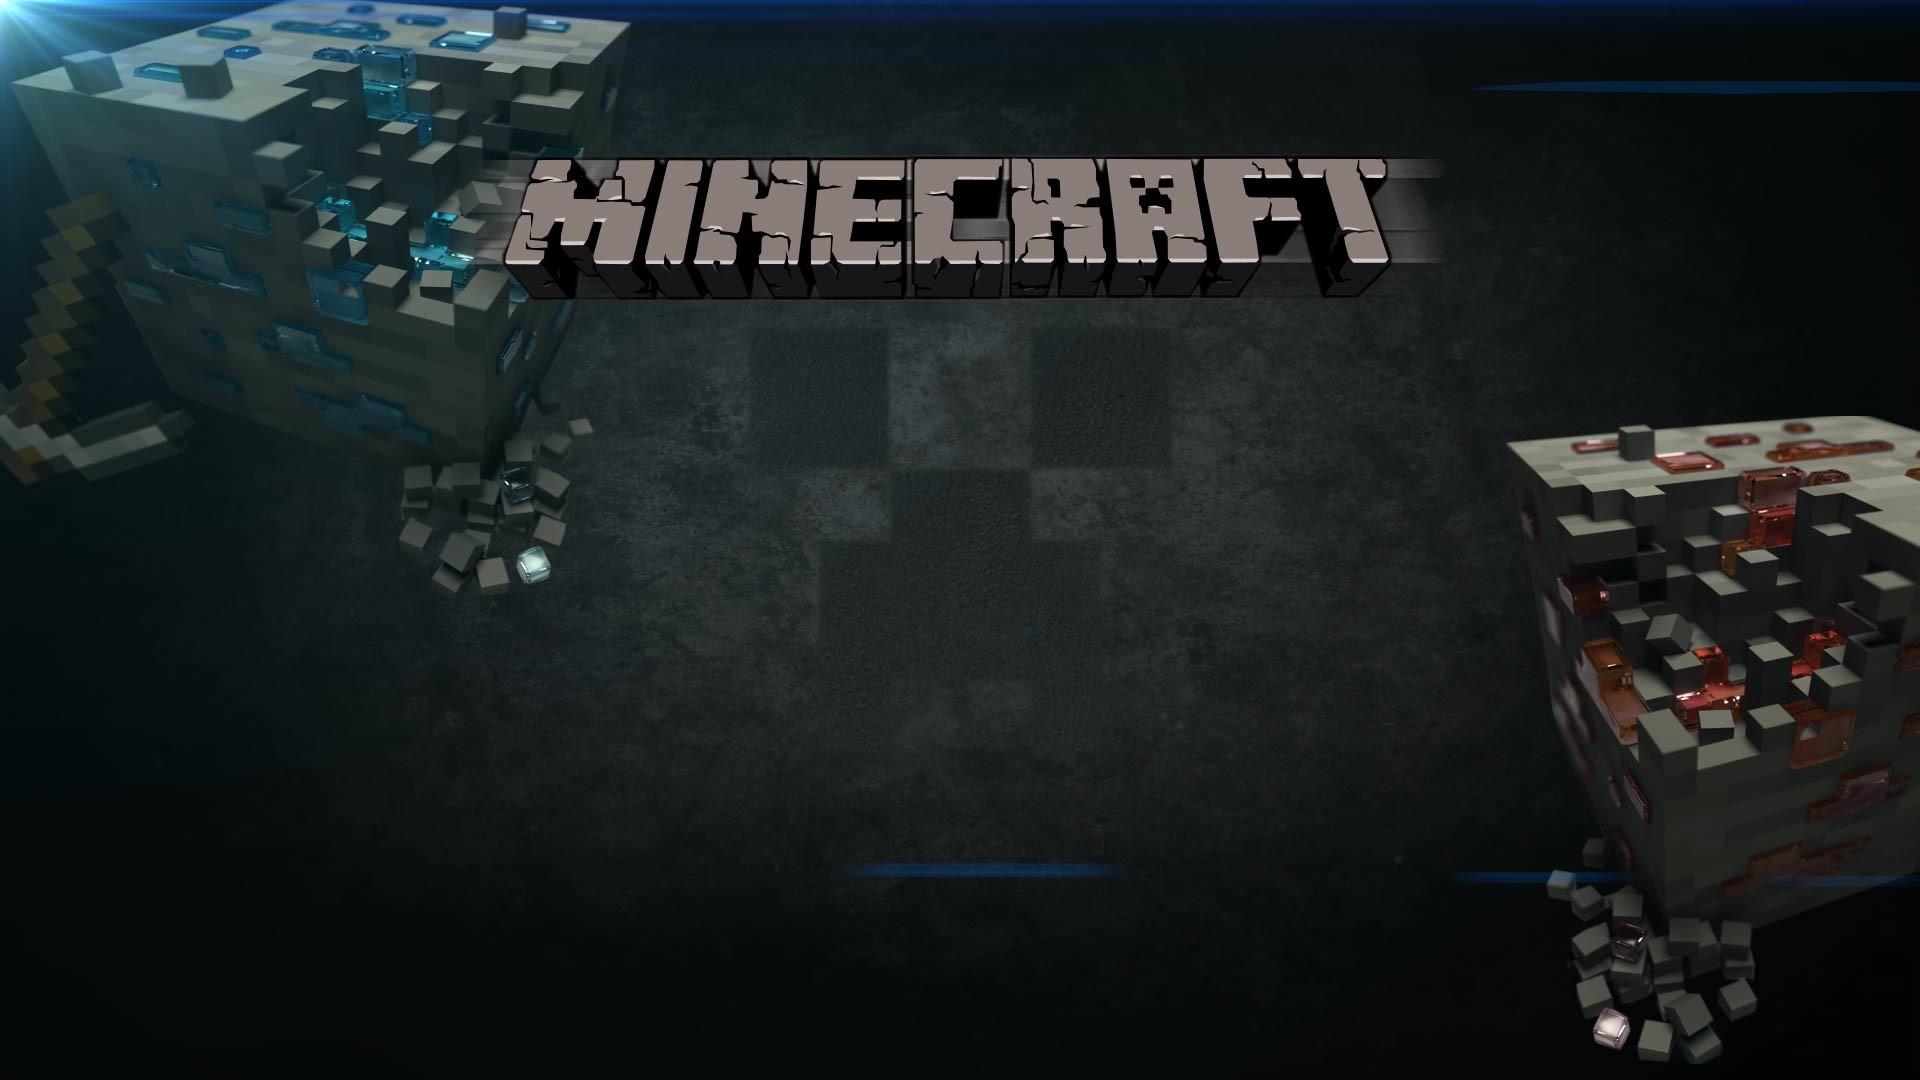 1920x1080 423551, Minecraft Lb Photo, Minecraft Texture, Hd Minecraft Wallpaper, Minecraft Images,